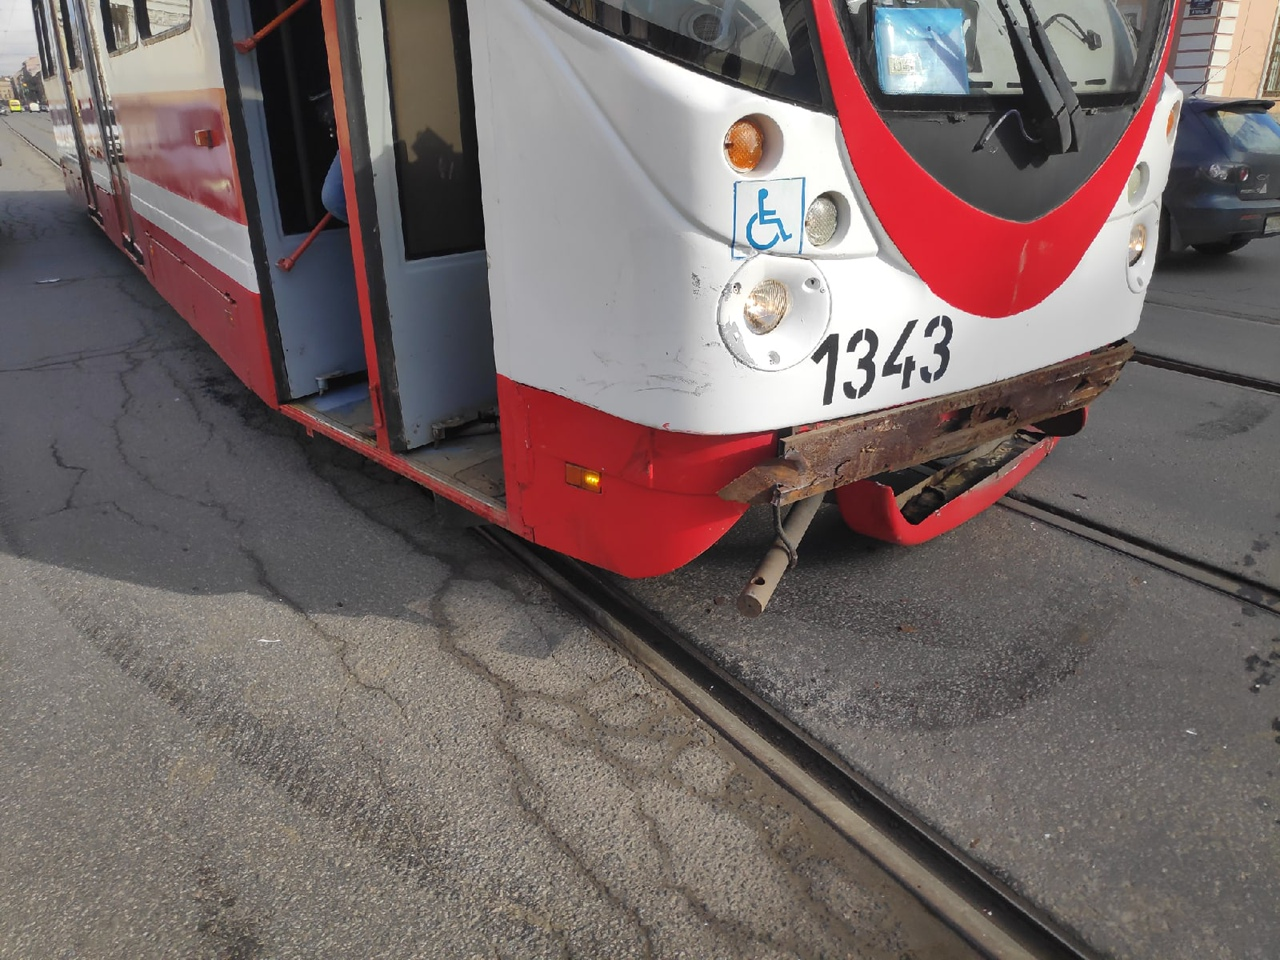 Volkswagen Туарег повернул перед трамваем на Троицком проспекте1 , Вагоновожатый ударил по тормозам...